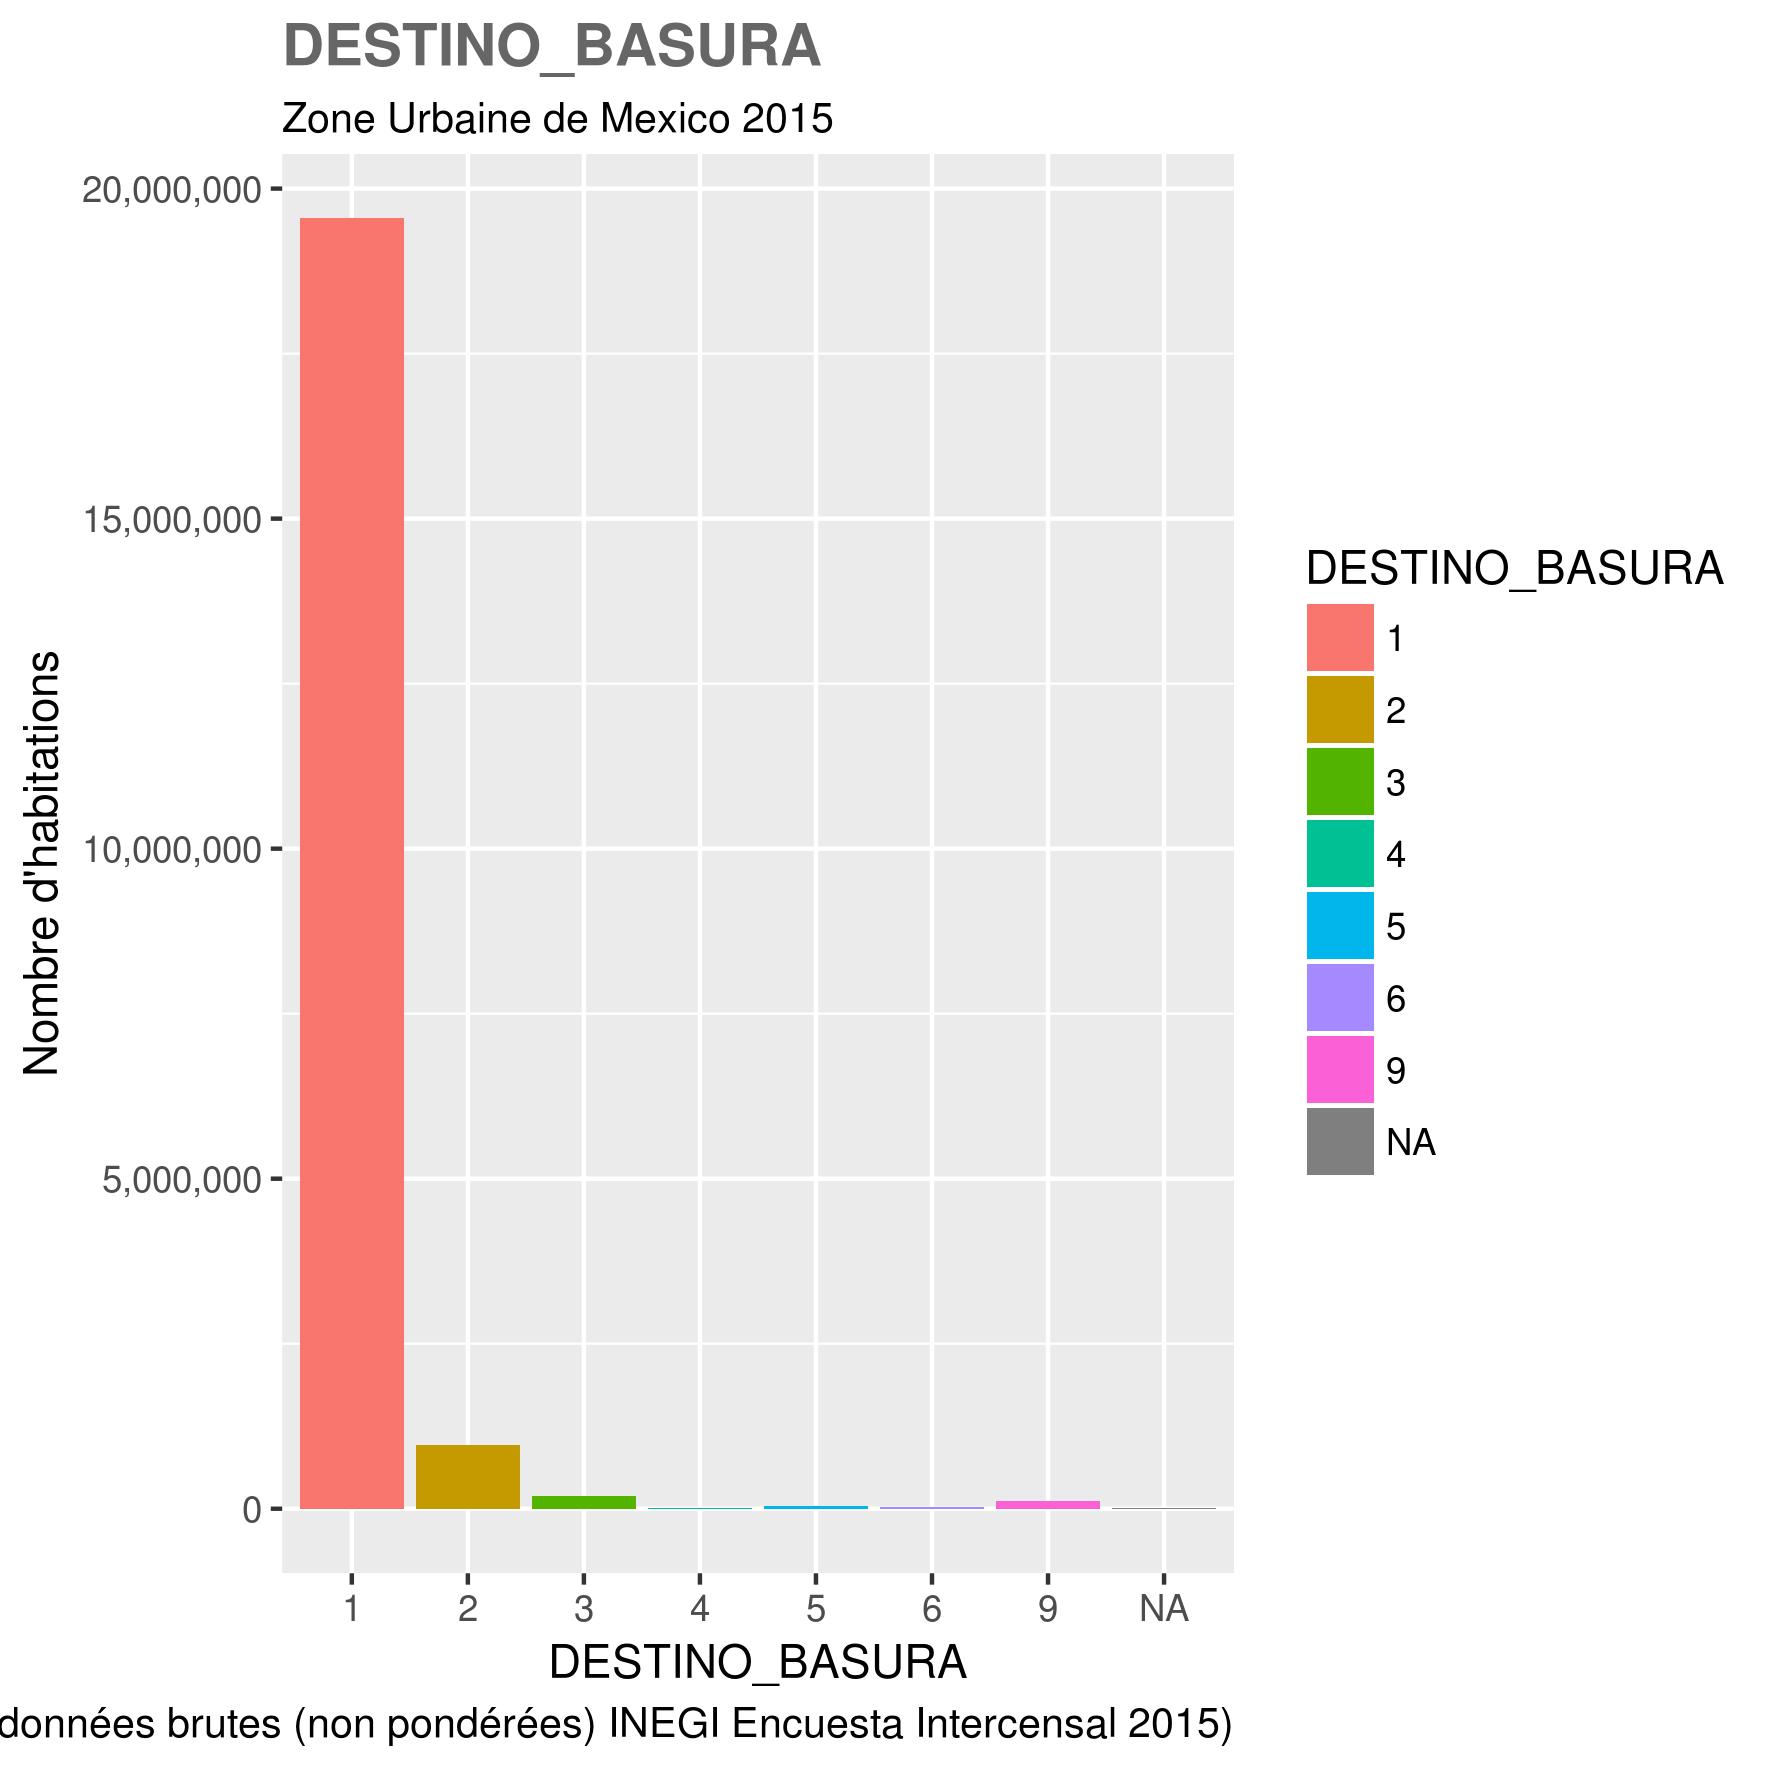 docs/images/ZUM_toutes_variables/2015_ZUM_DESTINO_BASURA.png